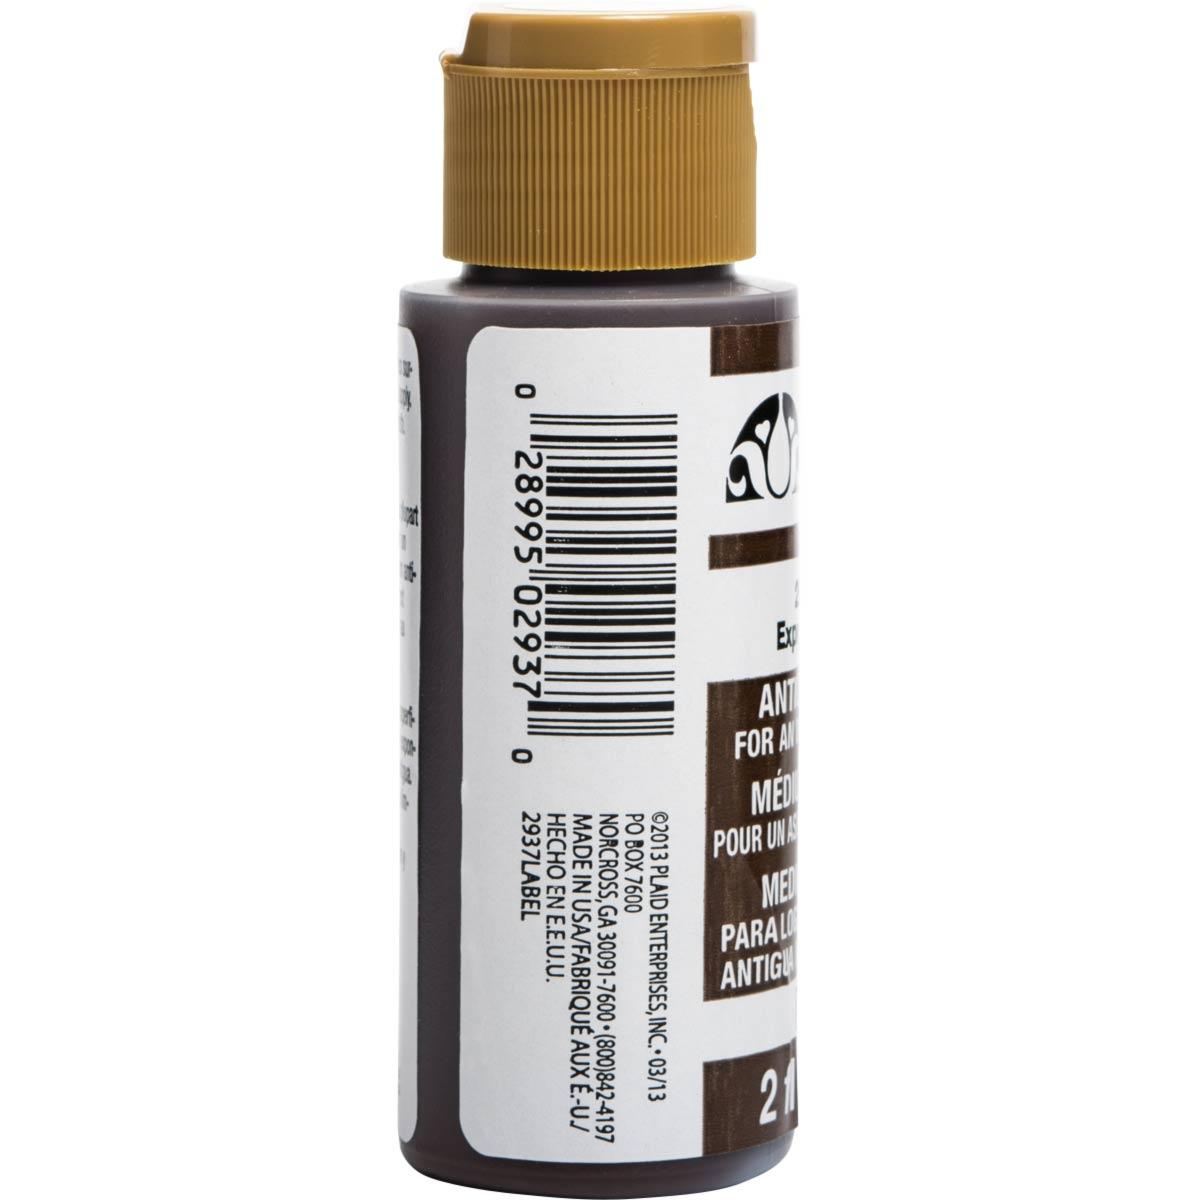 FolkArt ® Mediums - Antiquing Medium - Espresso, 2 oz.